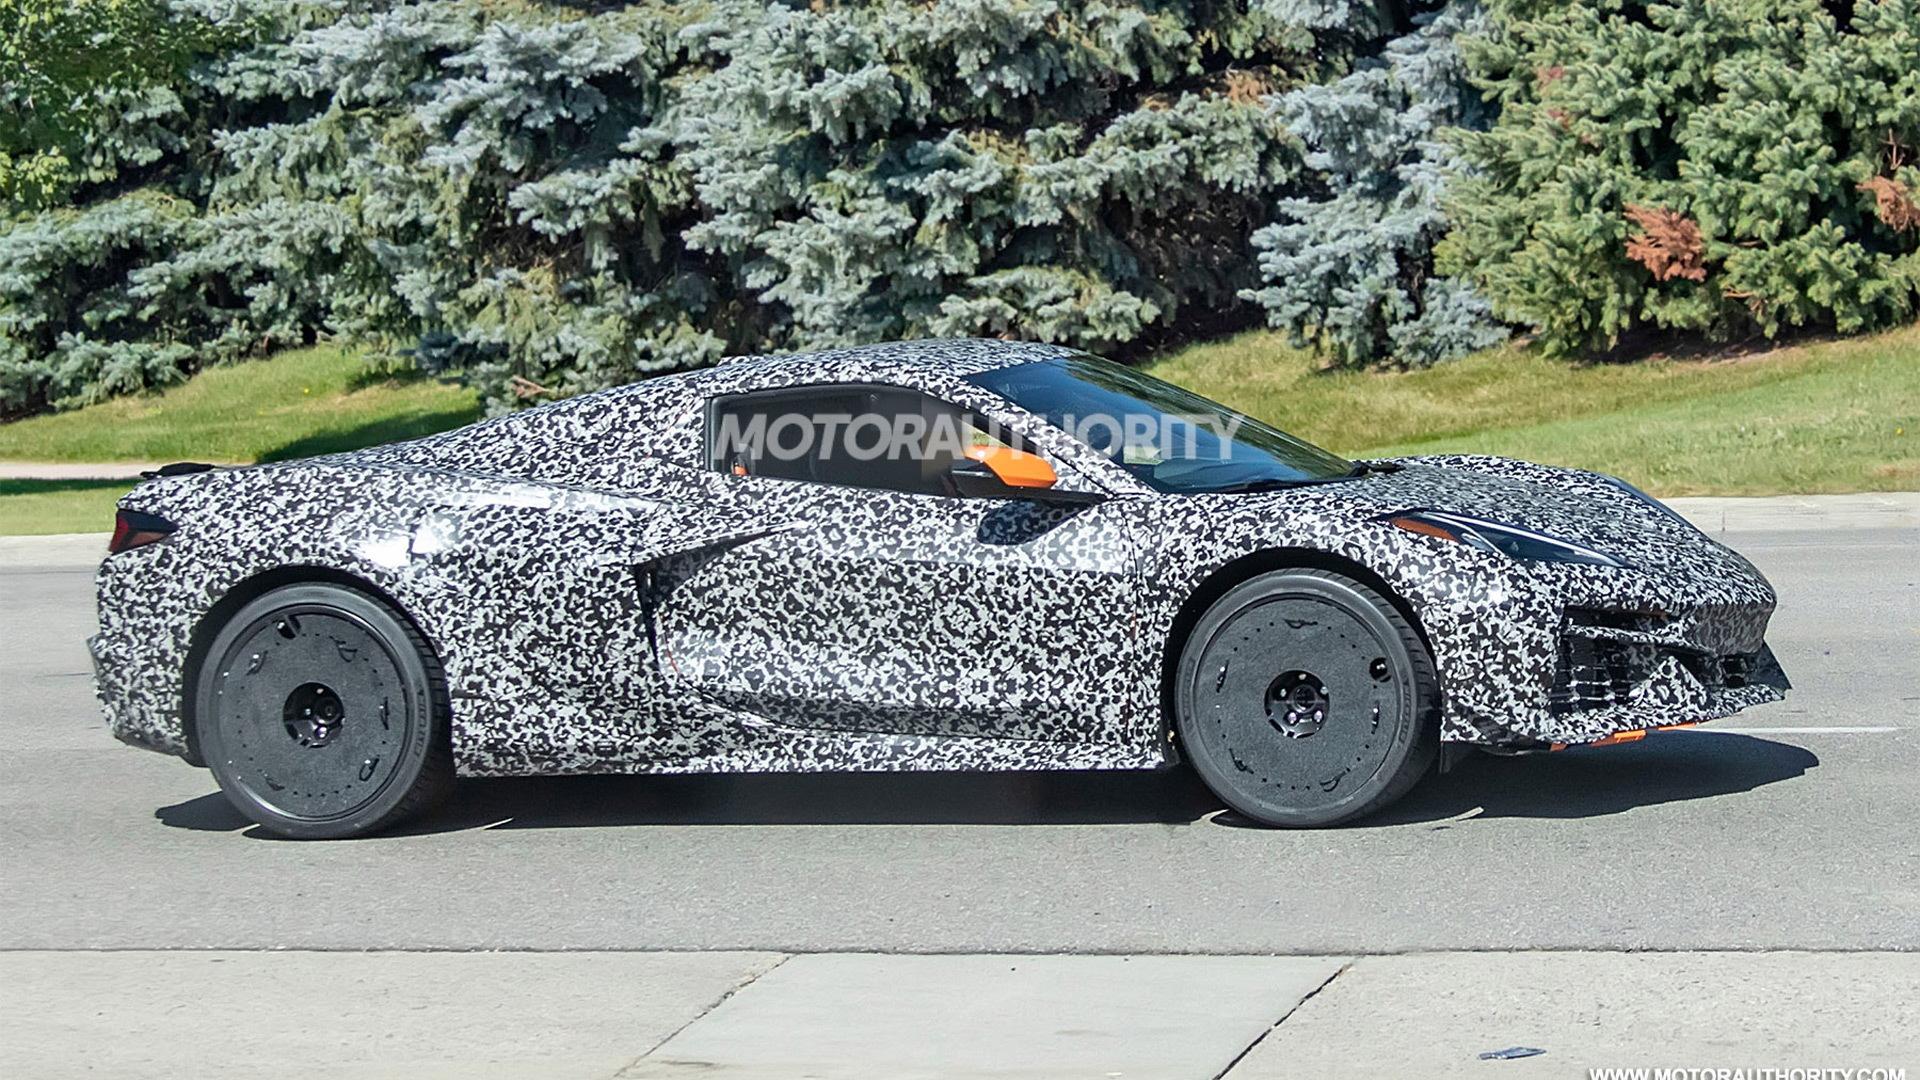 2023 Chevrolet Corvette Z06 Convertible spy shots - Photo credit:S. Baldauf/SB-Medien